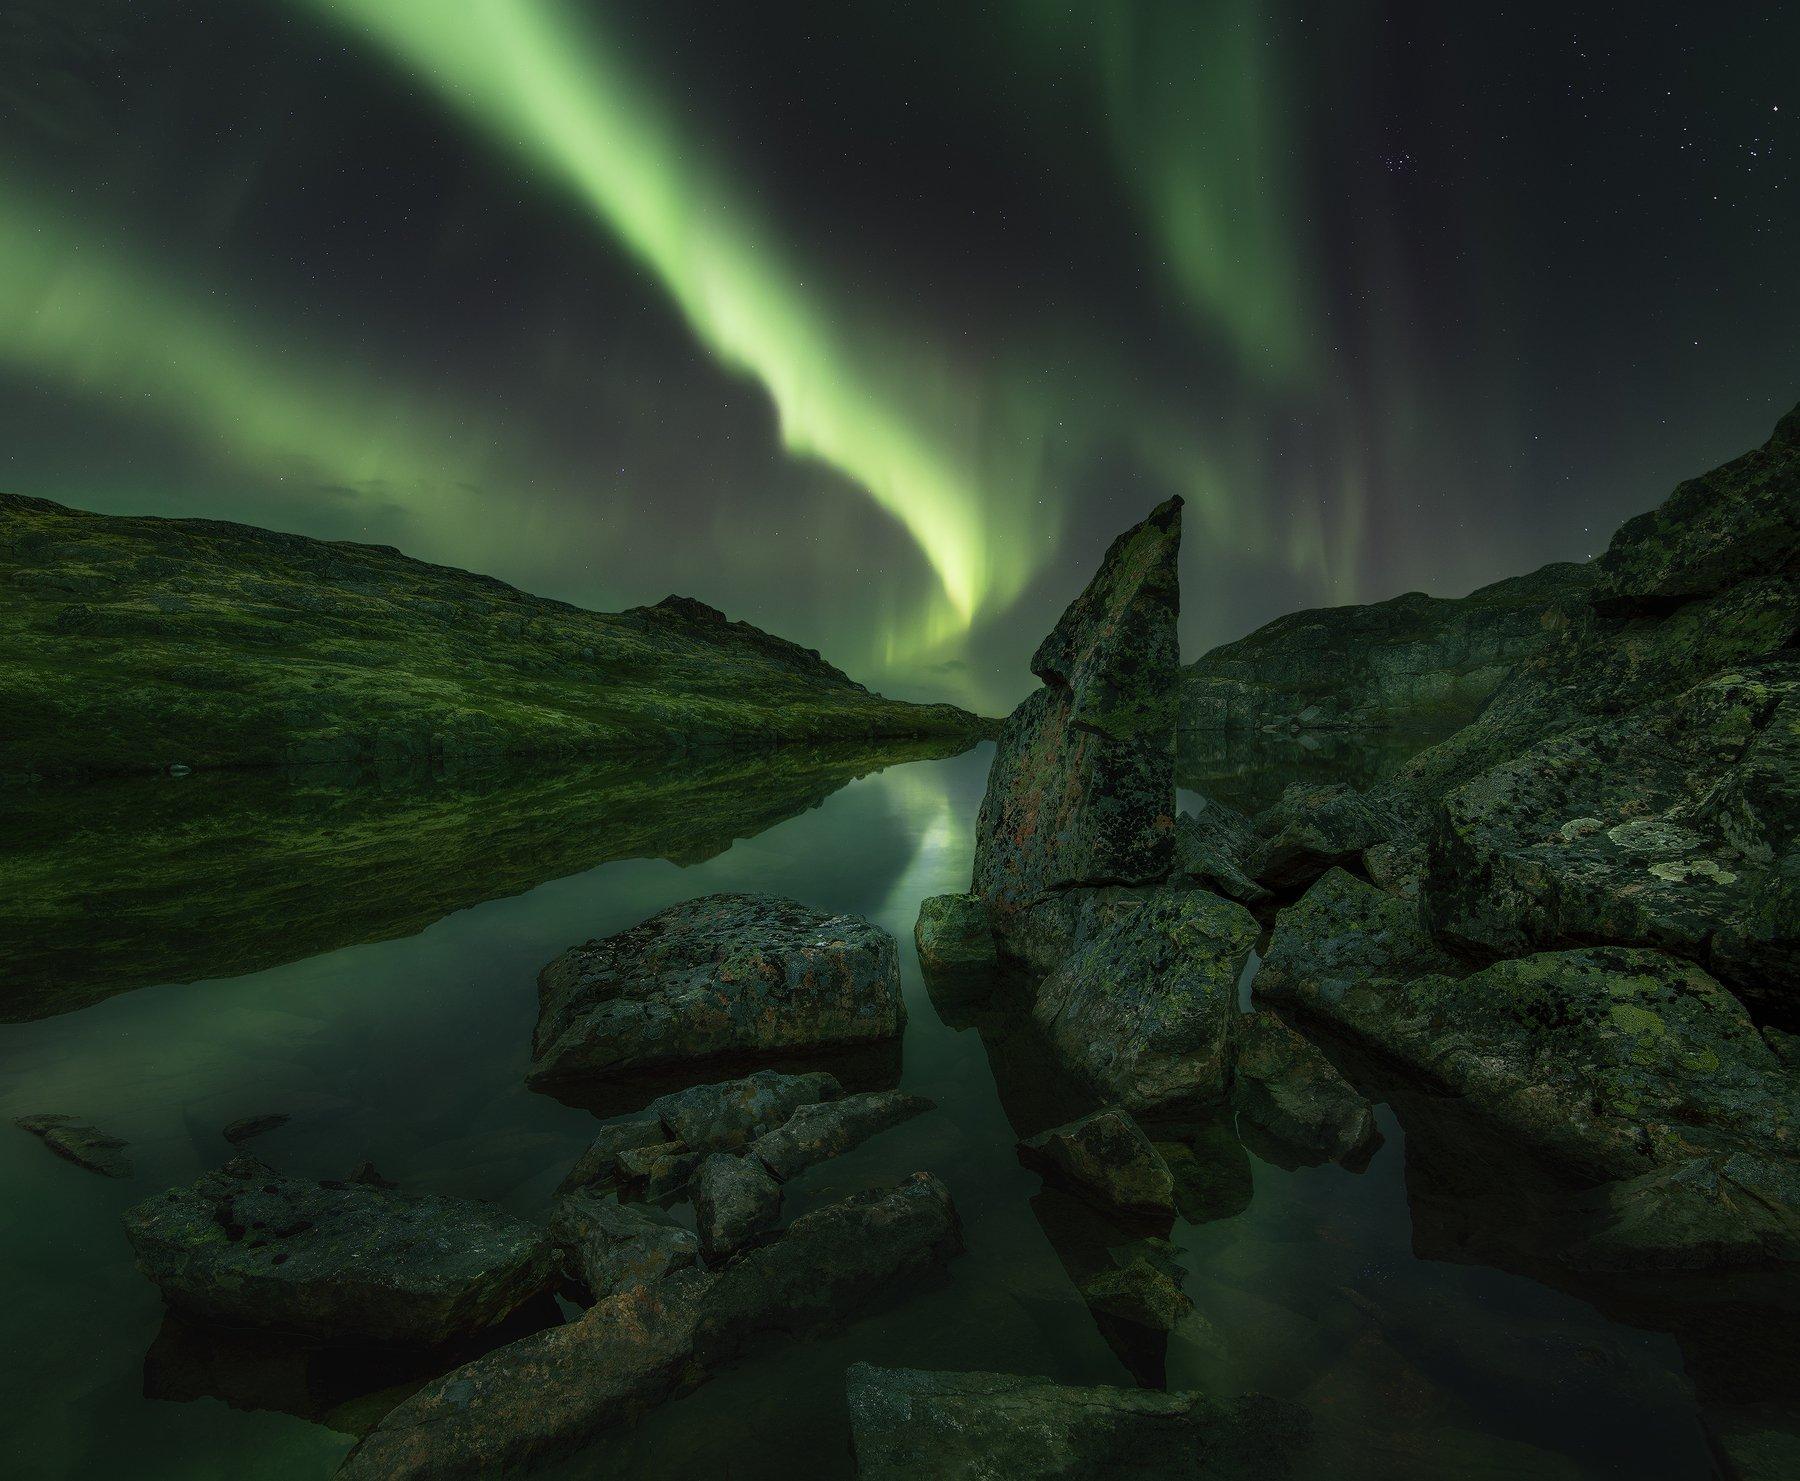 Северное сияние, Aurora Borealis, Баренцево море, Васильев Алексей